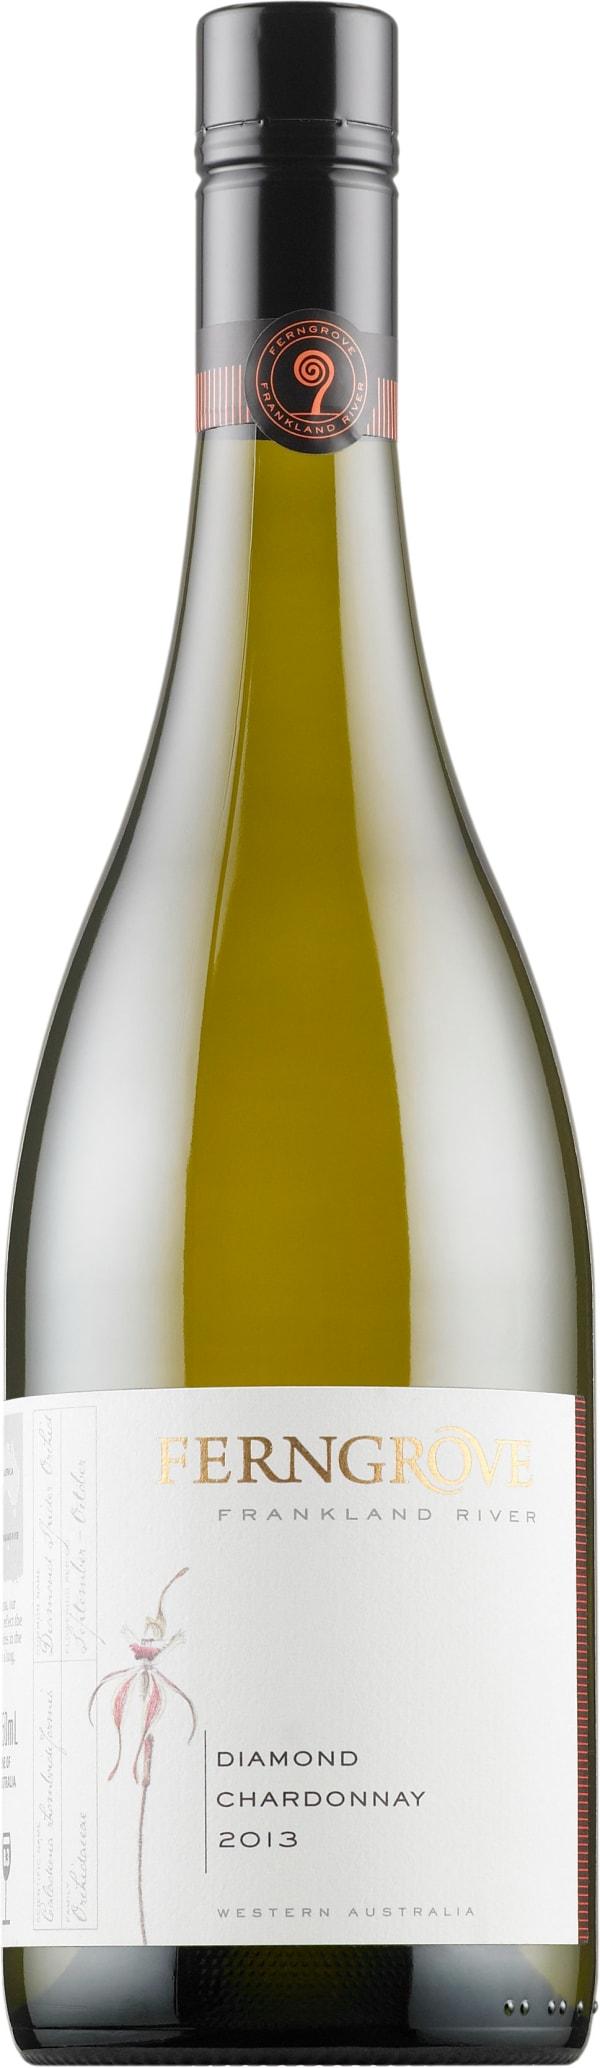 Ferngrove Diamond Chardonnay 2014